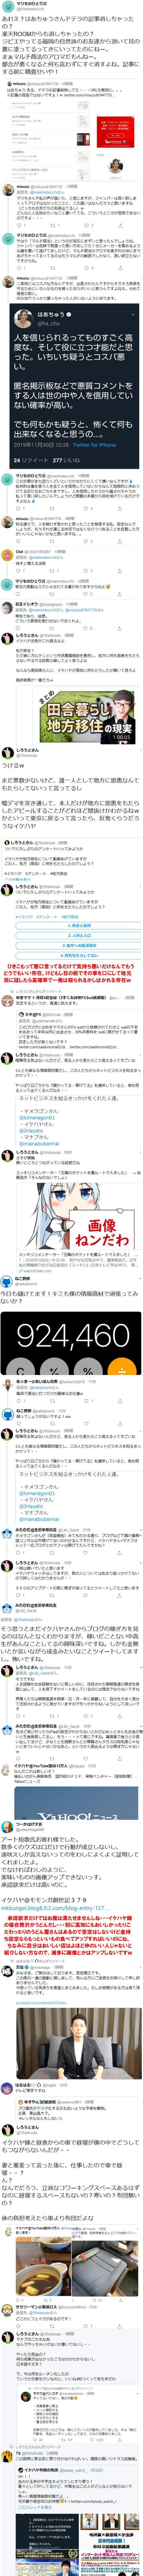 200131-A4